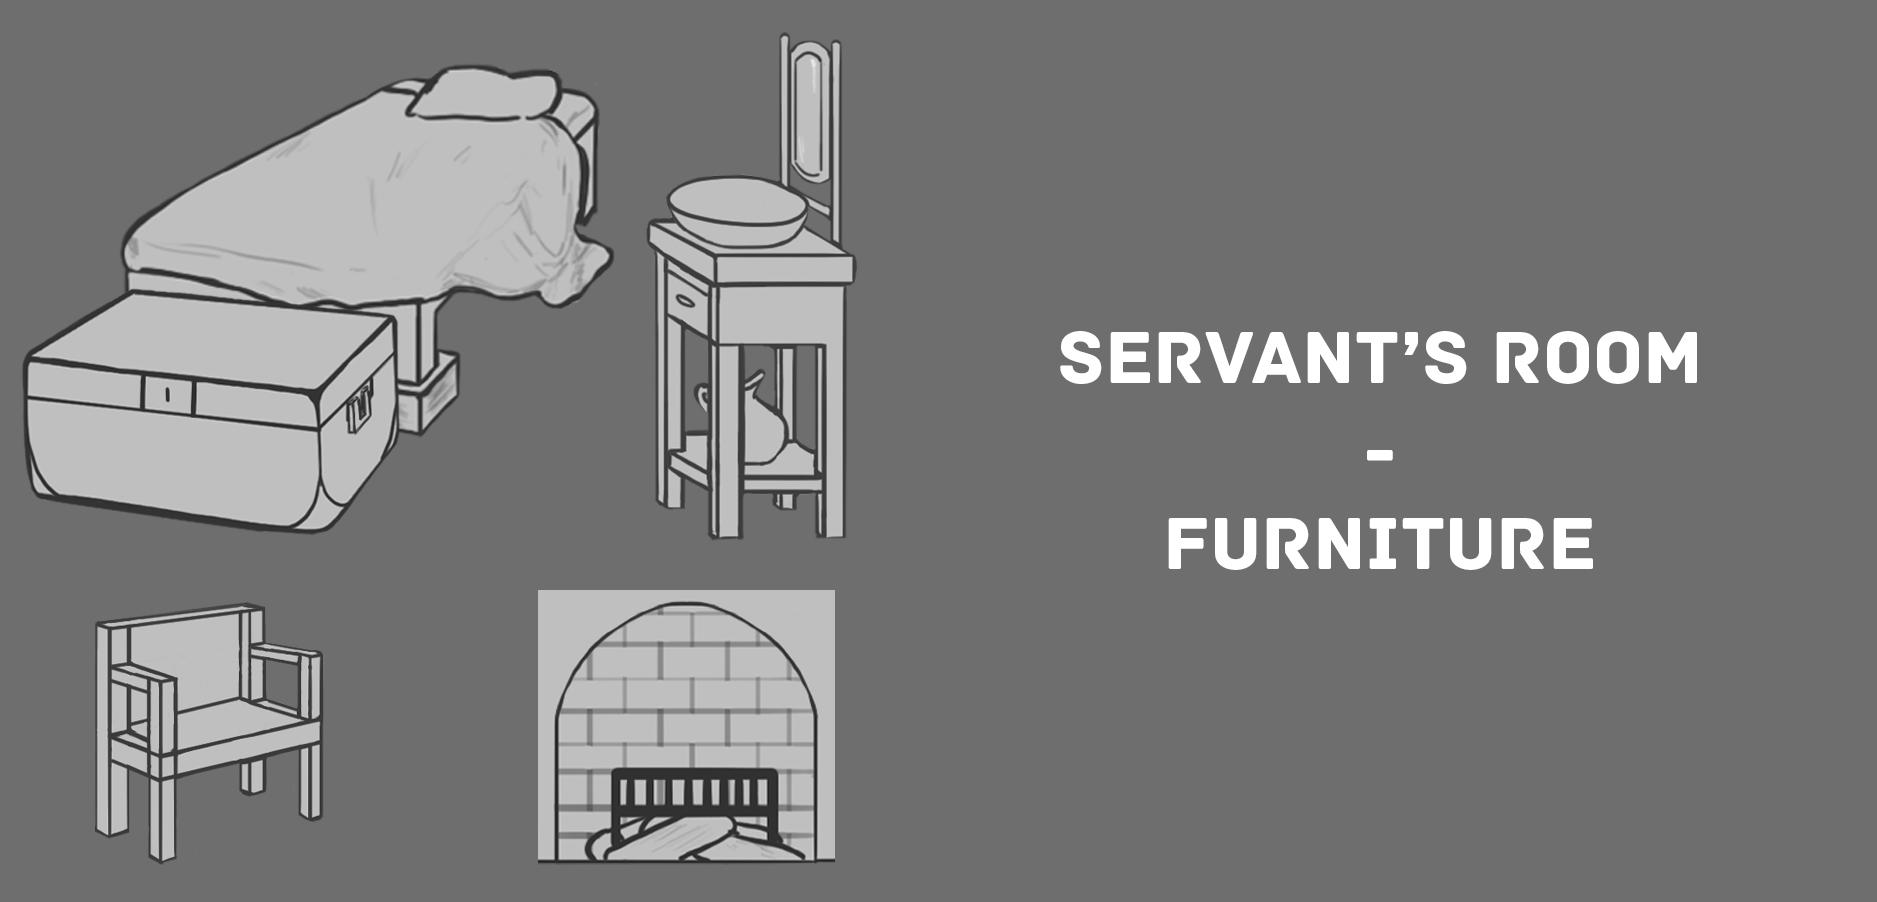 12a RD Servants Room Furniture